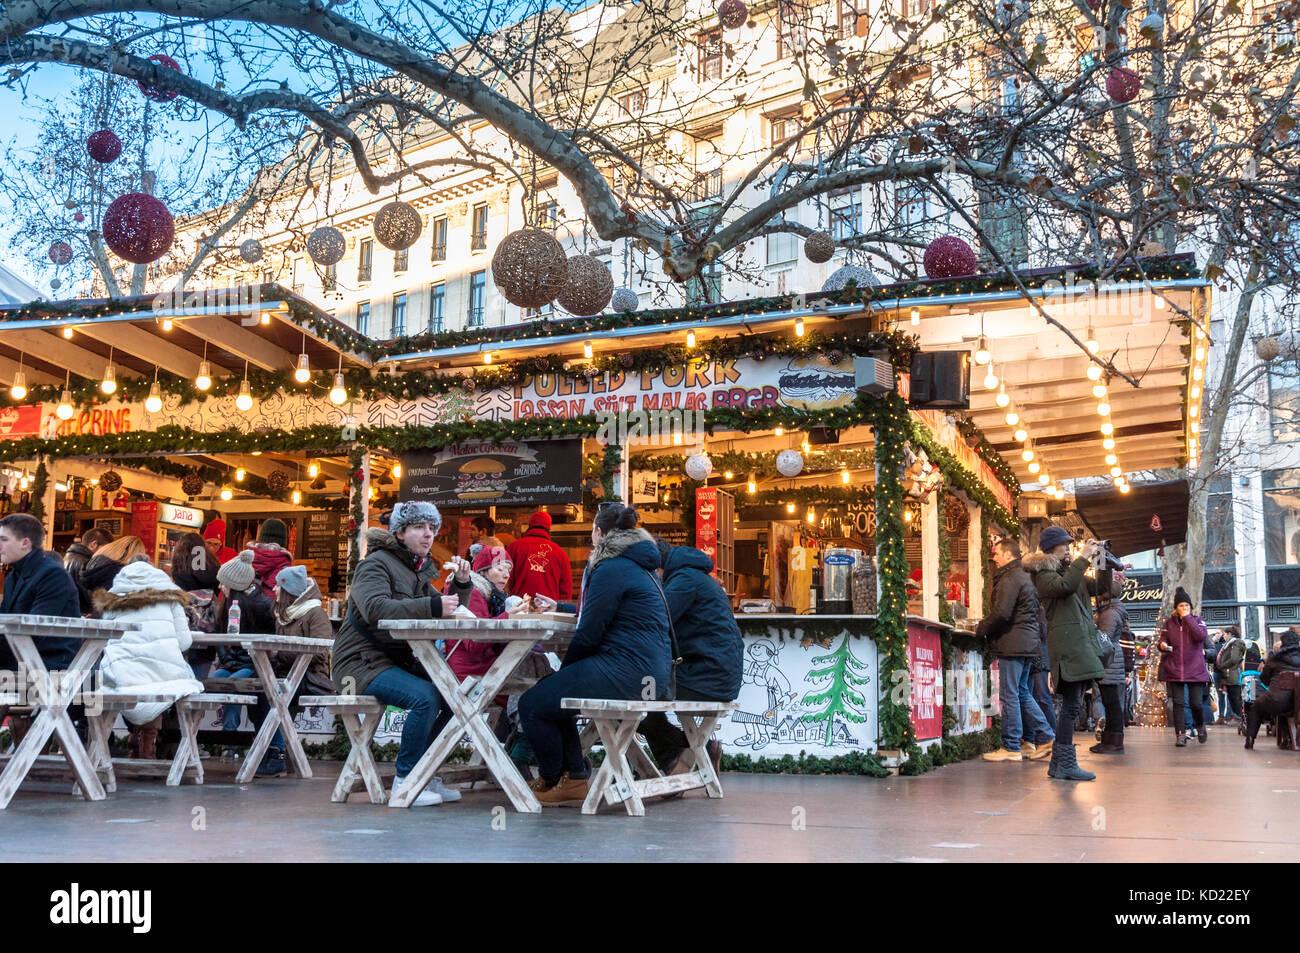 Vorosmarty Square Budapest Christmas Market.Christmas Market On Vorosmarty Square Budapest Stock Photo